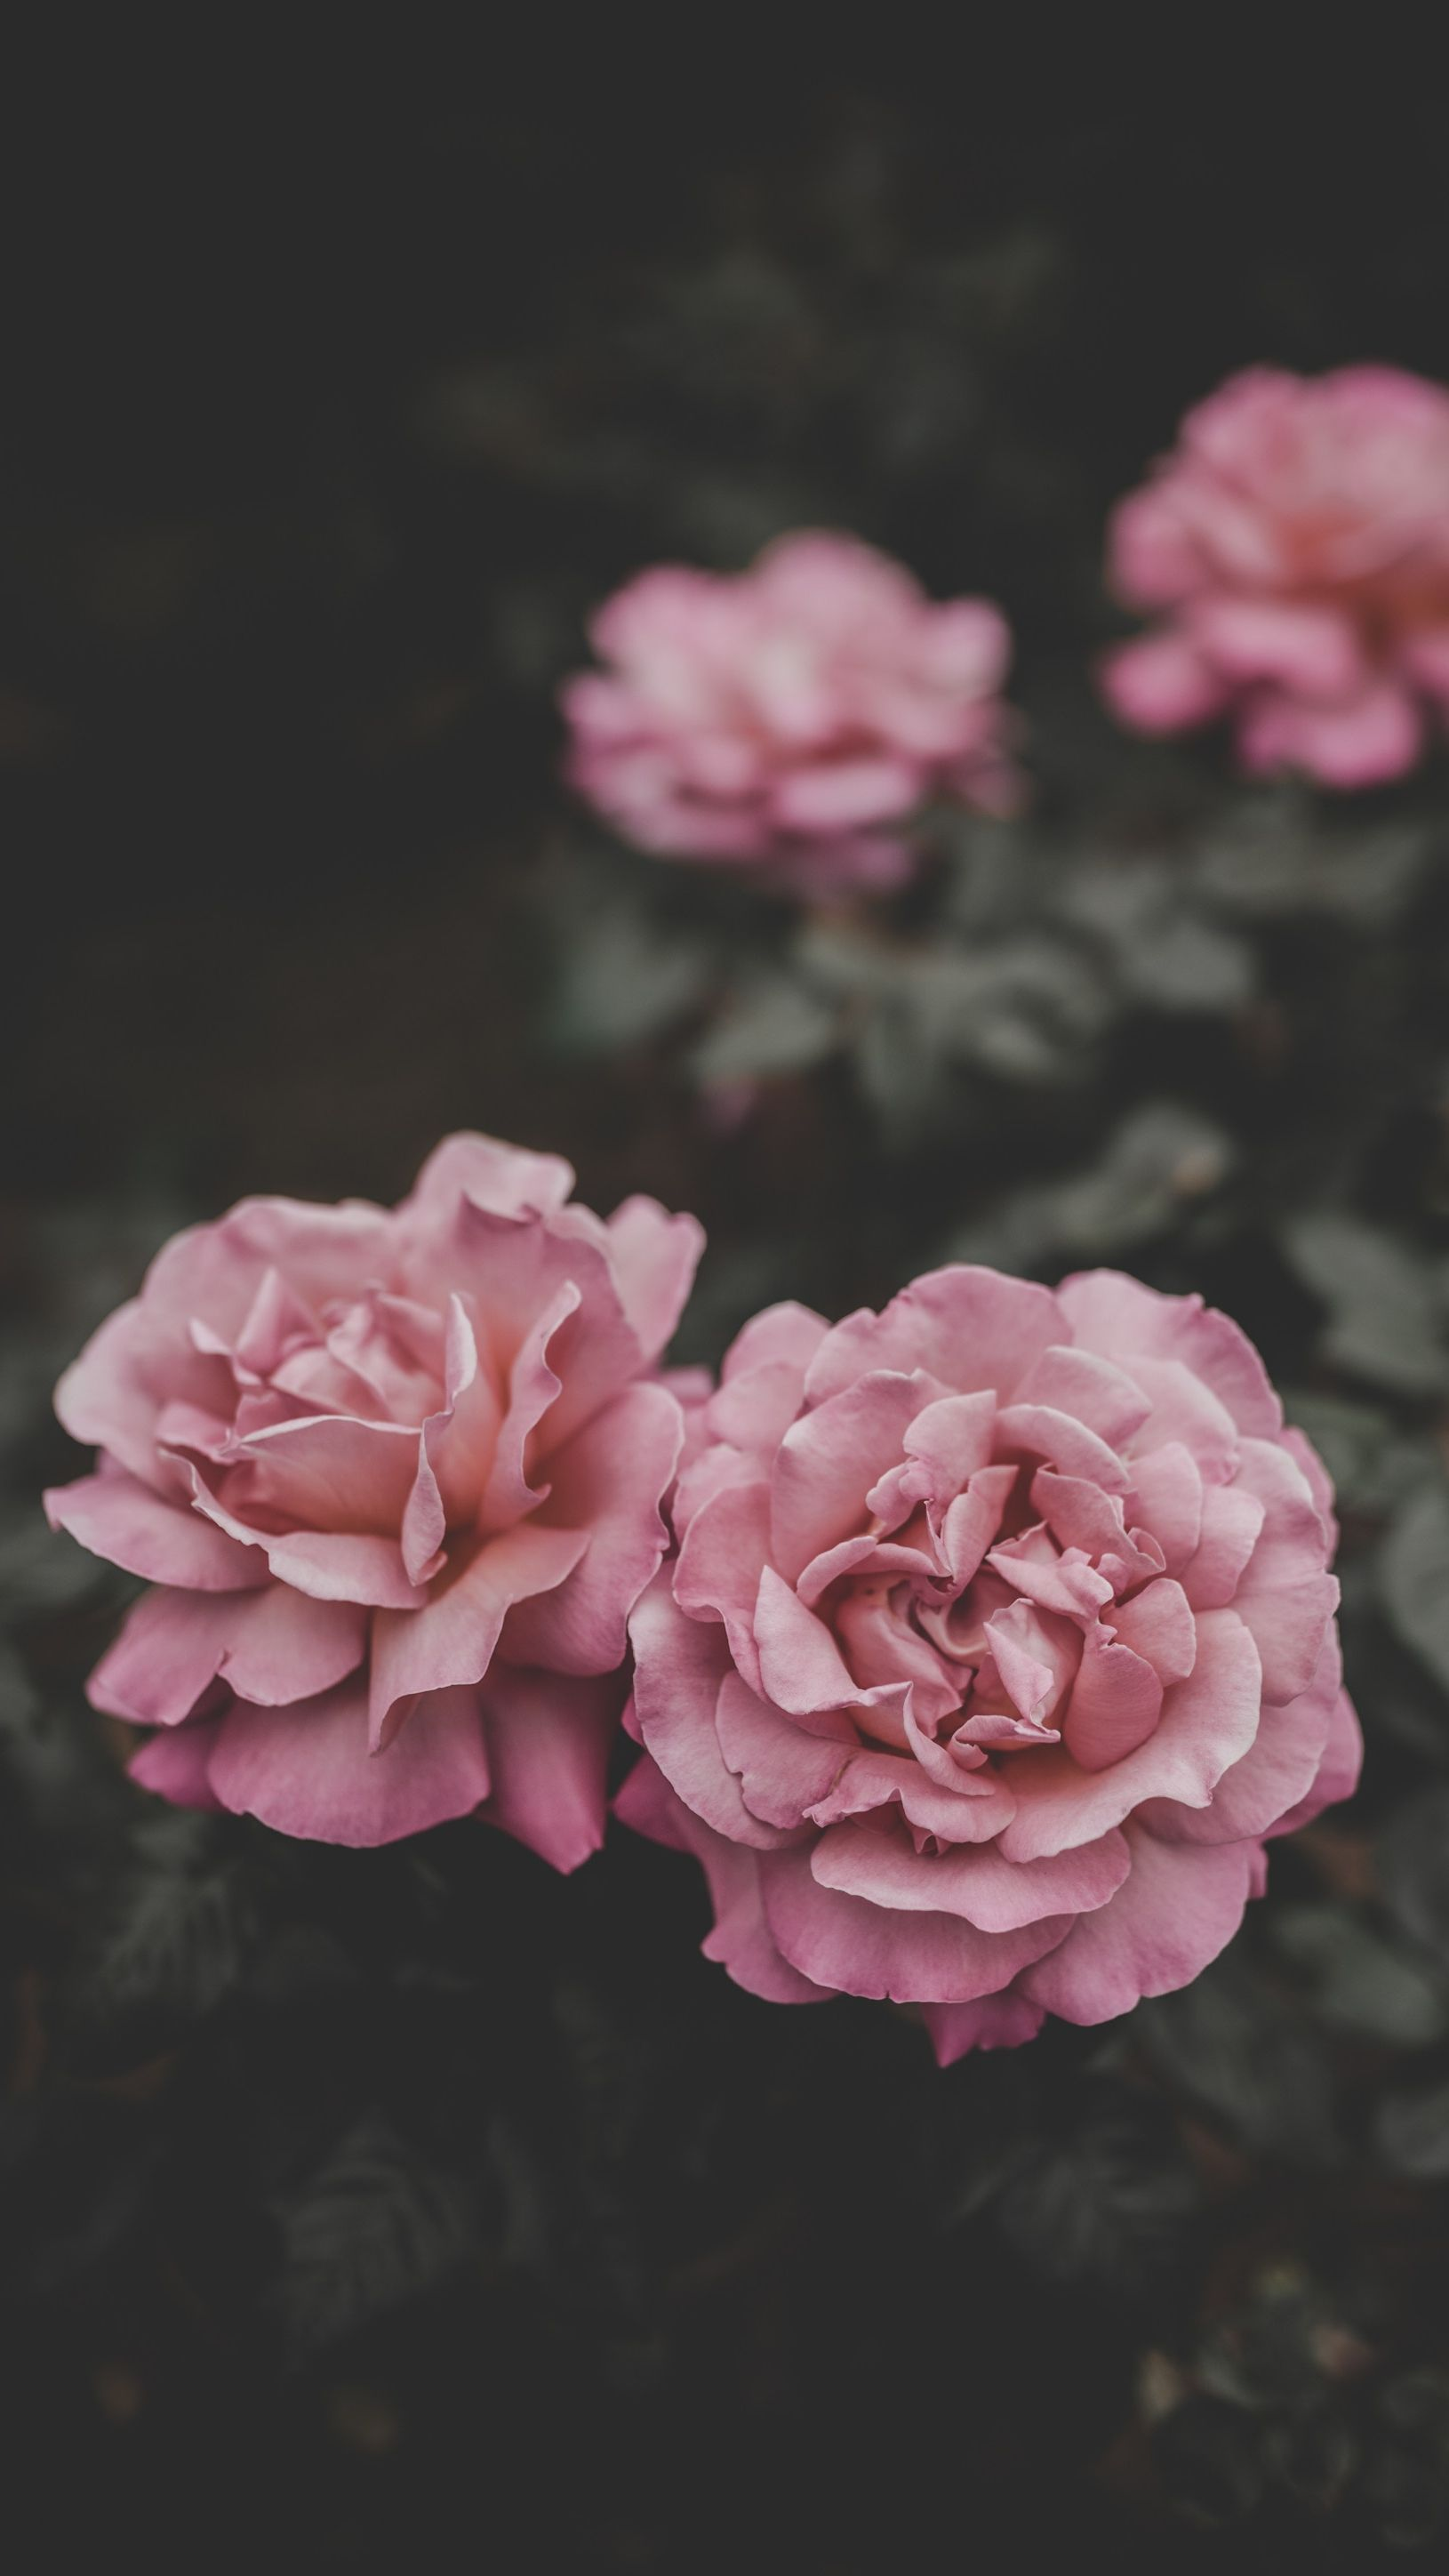 Download Wallpaper Flower Iphone HD